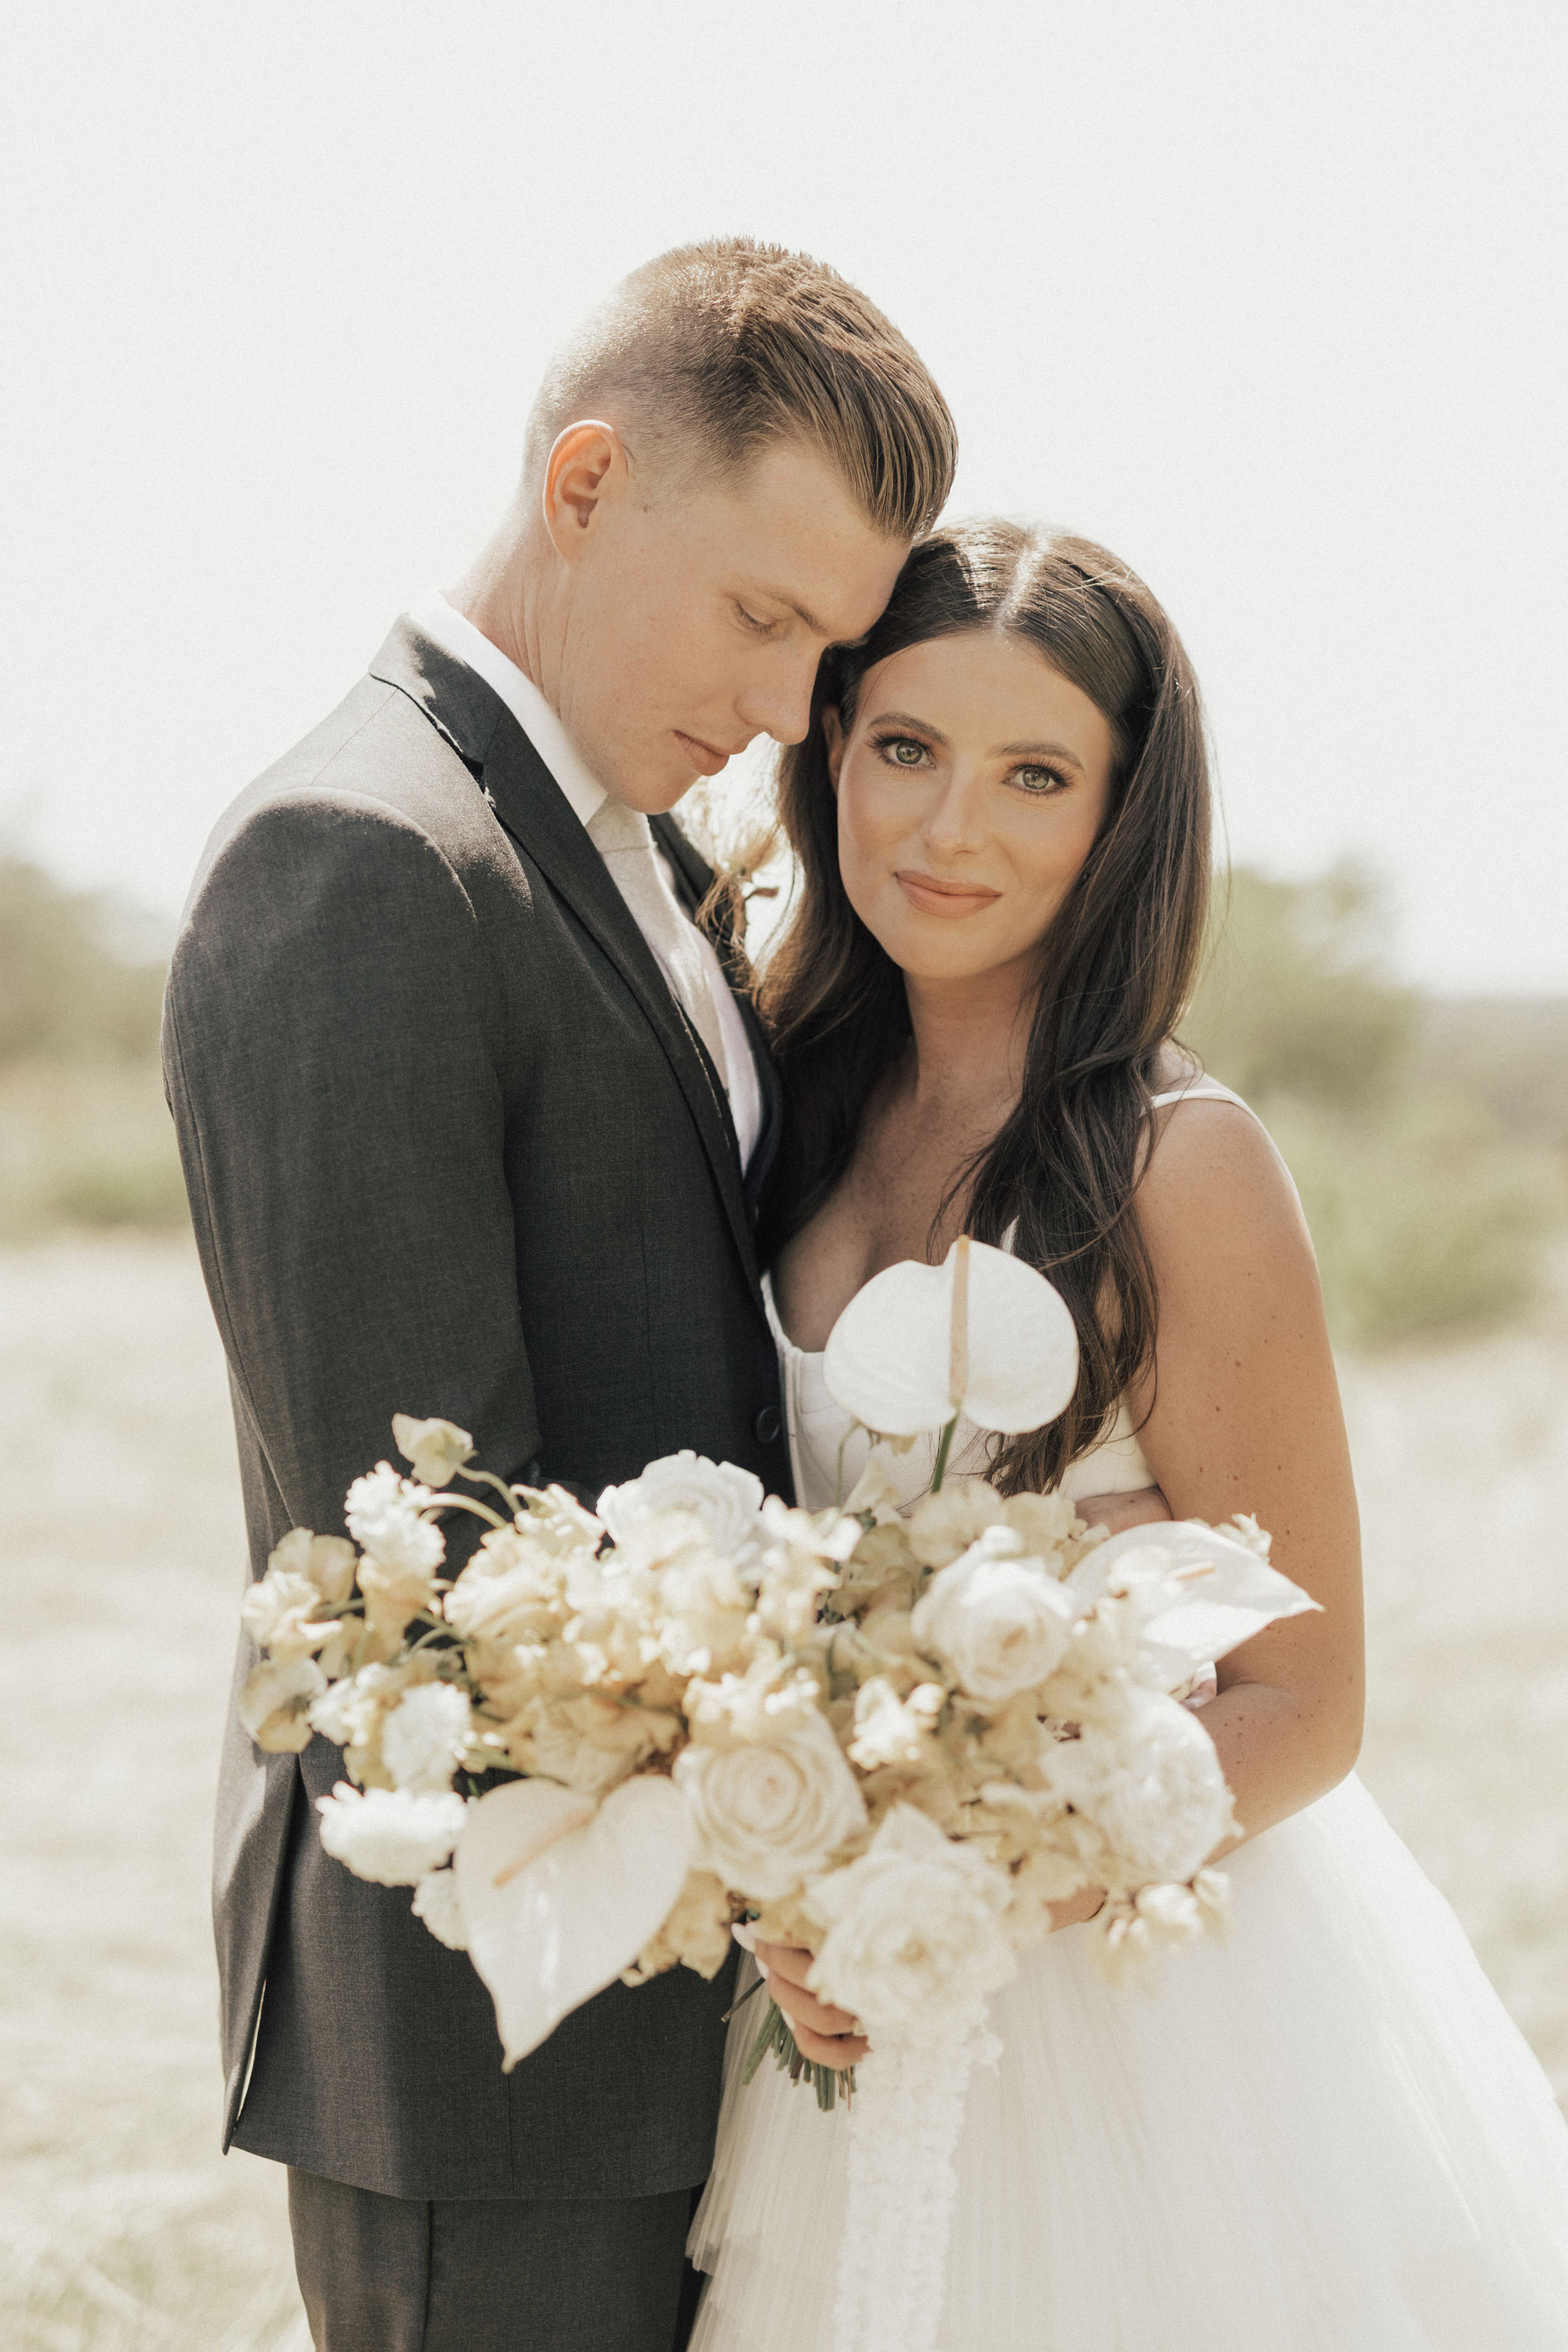 Neutral + Natural Bridal Makeup